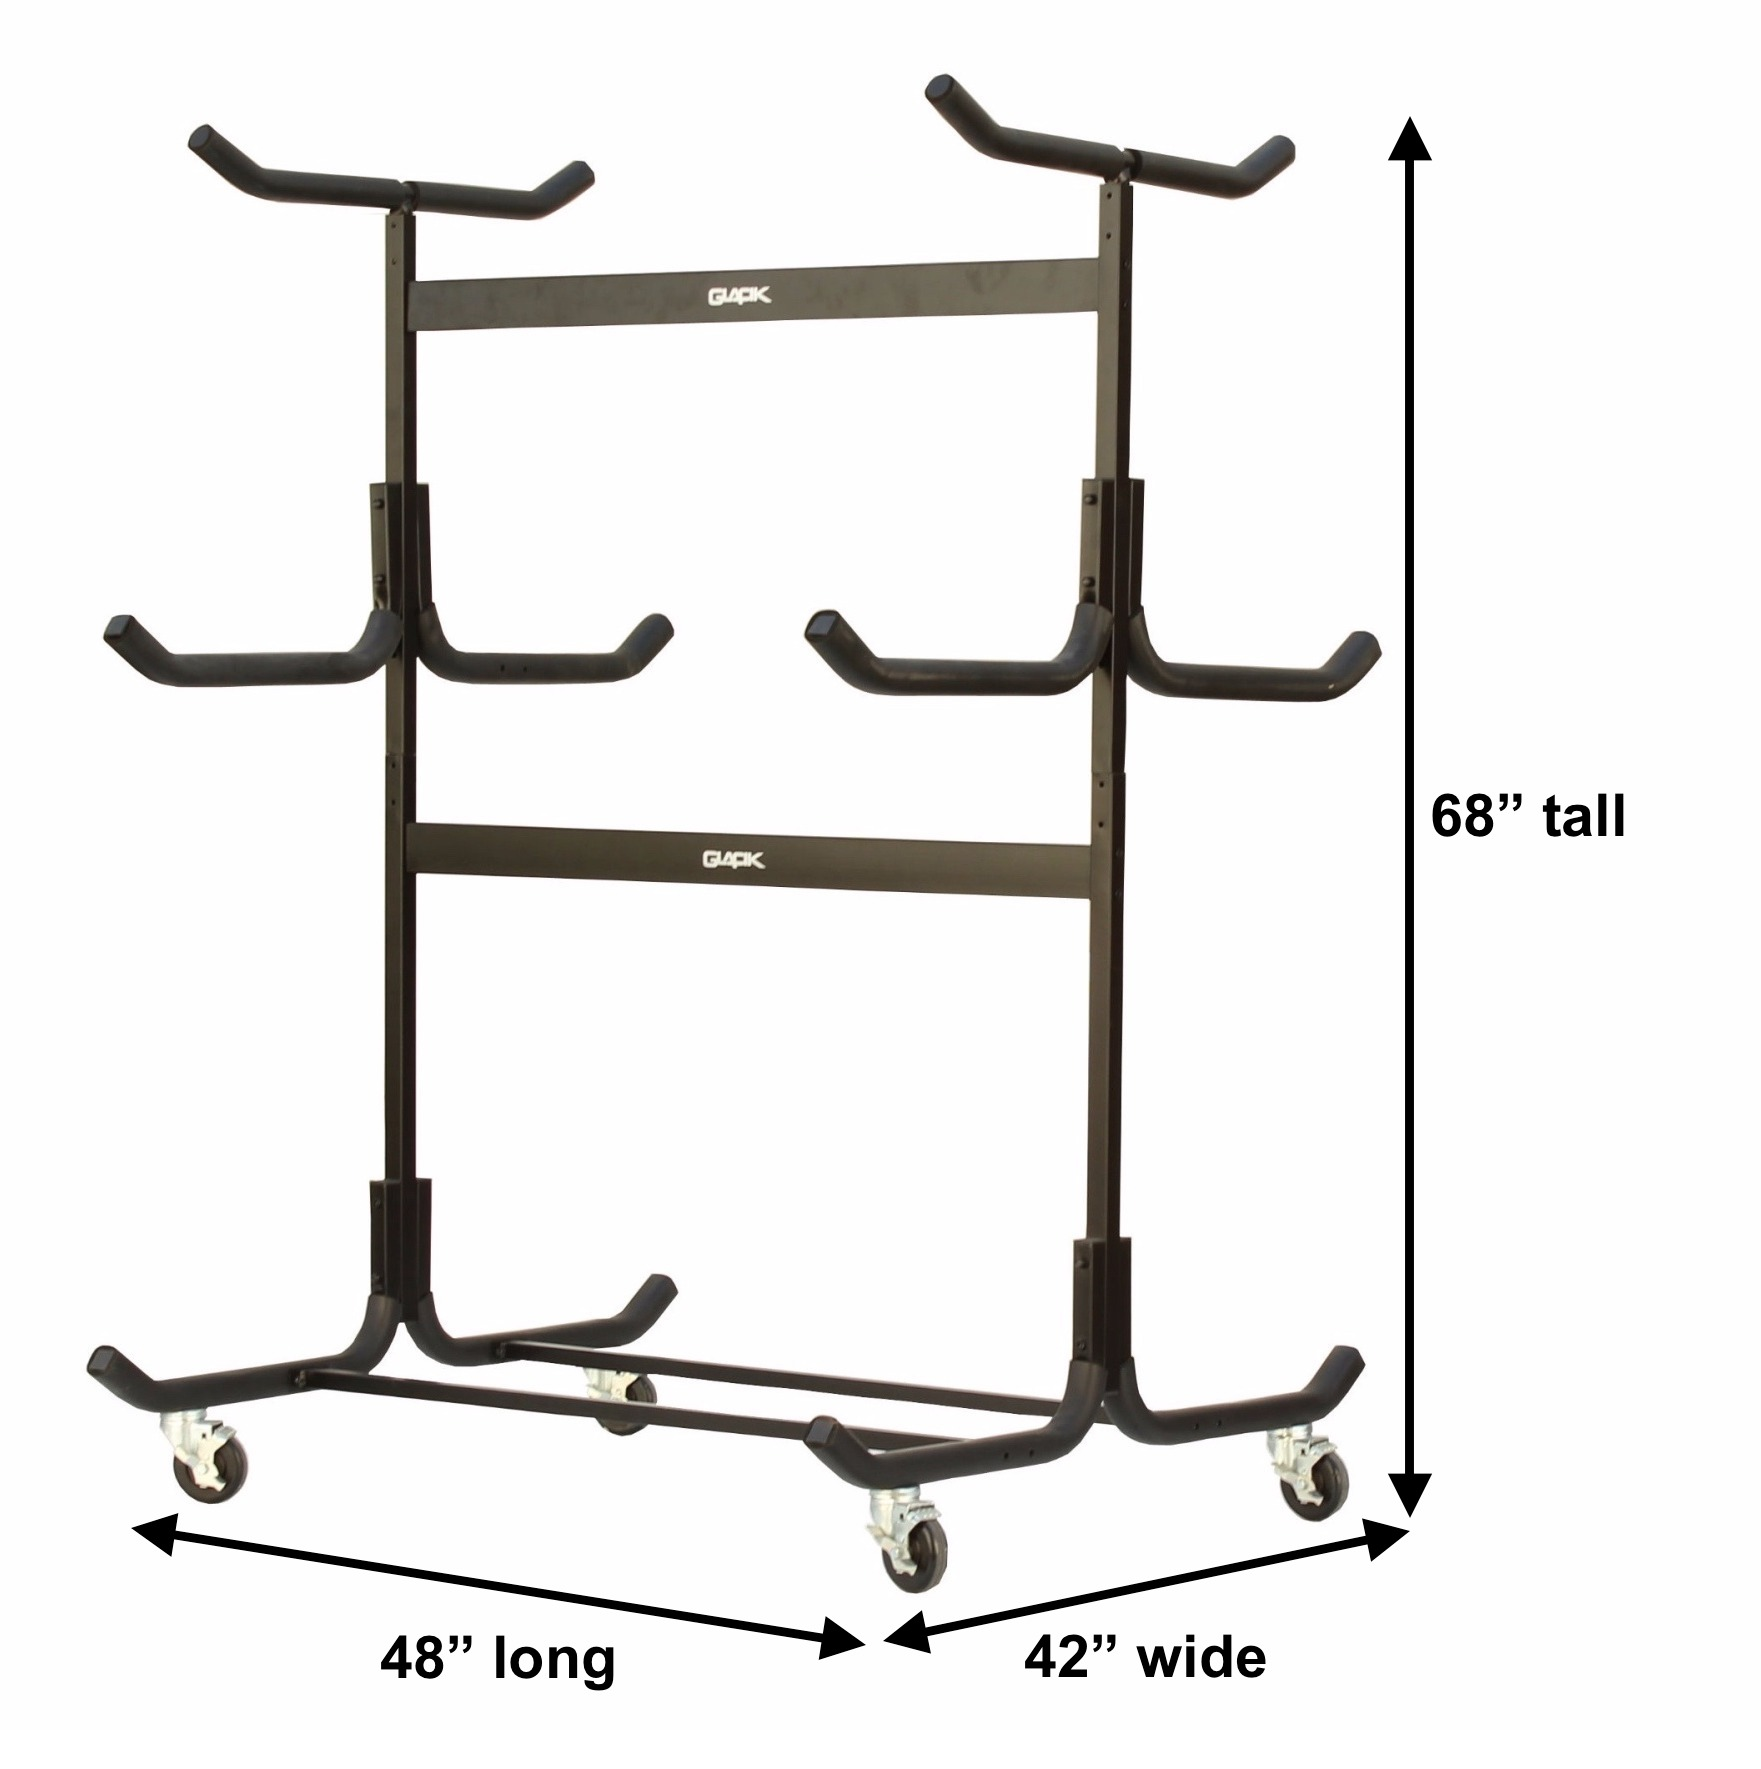 freestanding-kayak-rack-dimensions.jpeg